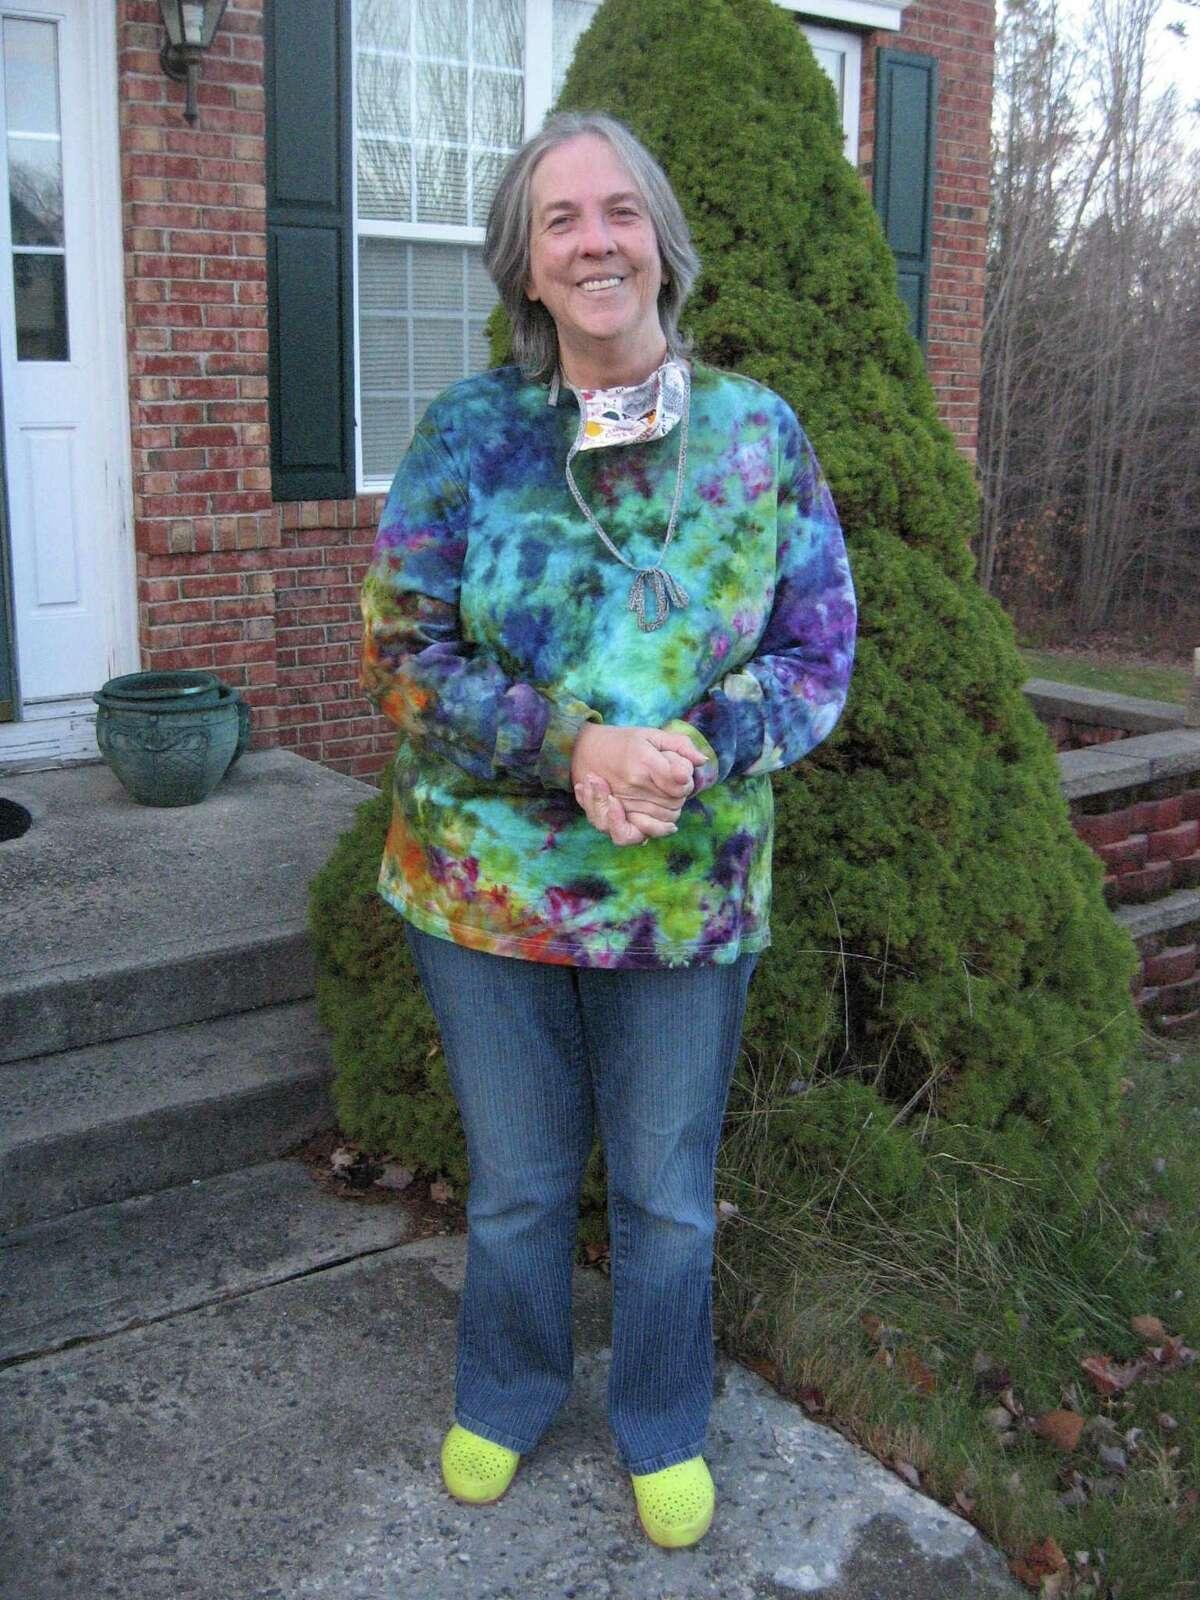 Margaret Gumbs, aka